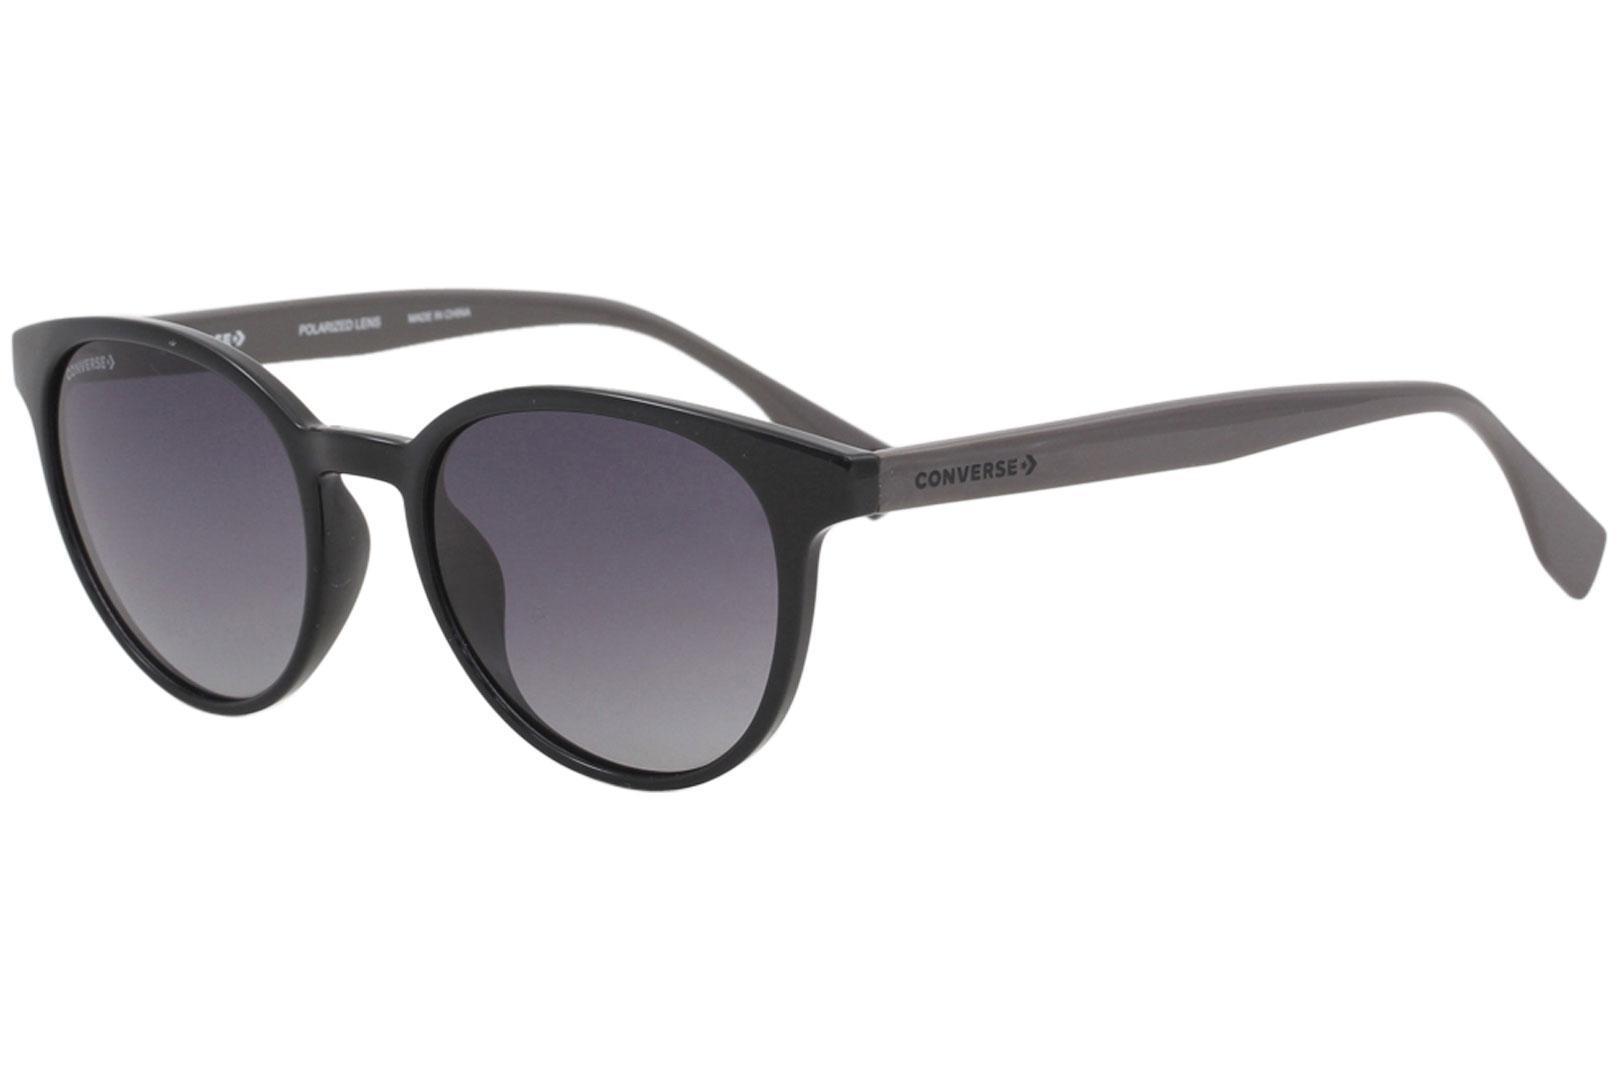 1a08986e450 Converse Women s SCO048 SCO 048 Polarized Fashion Oval Sunglasses